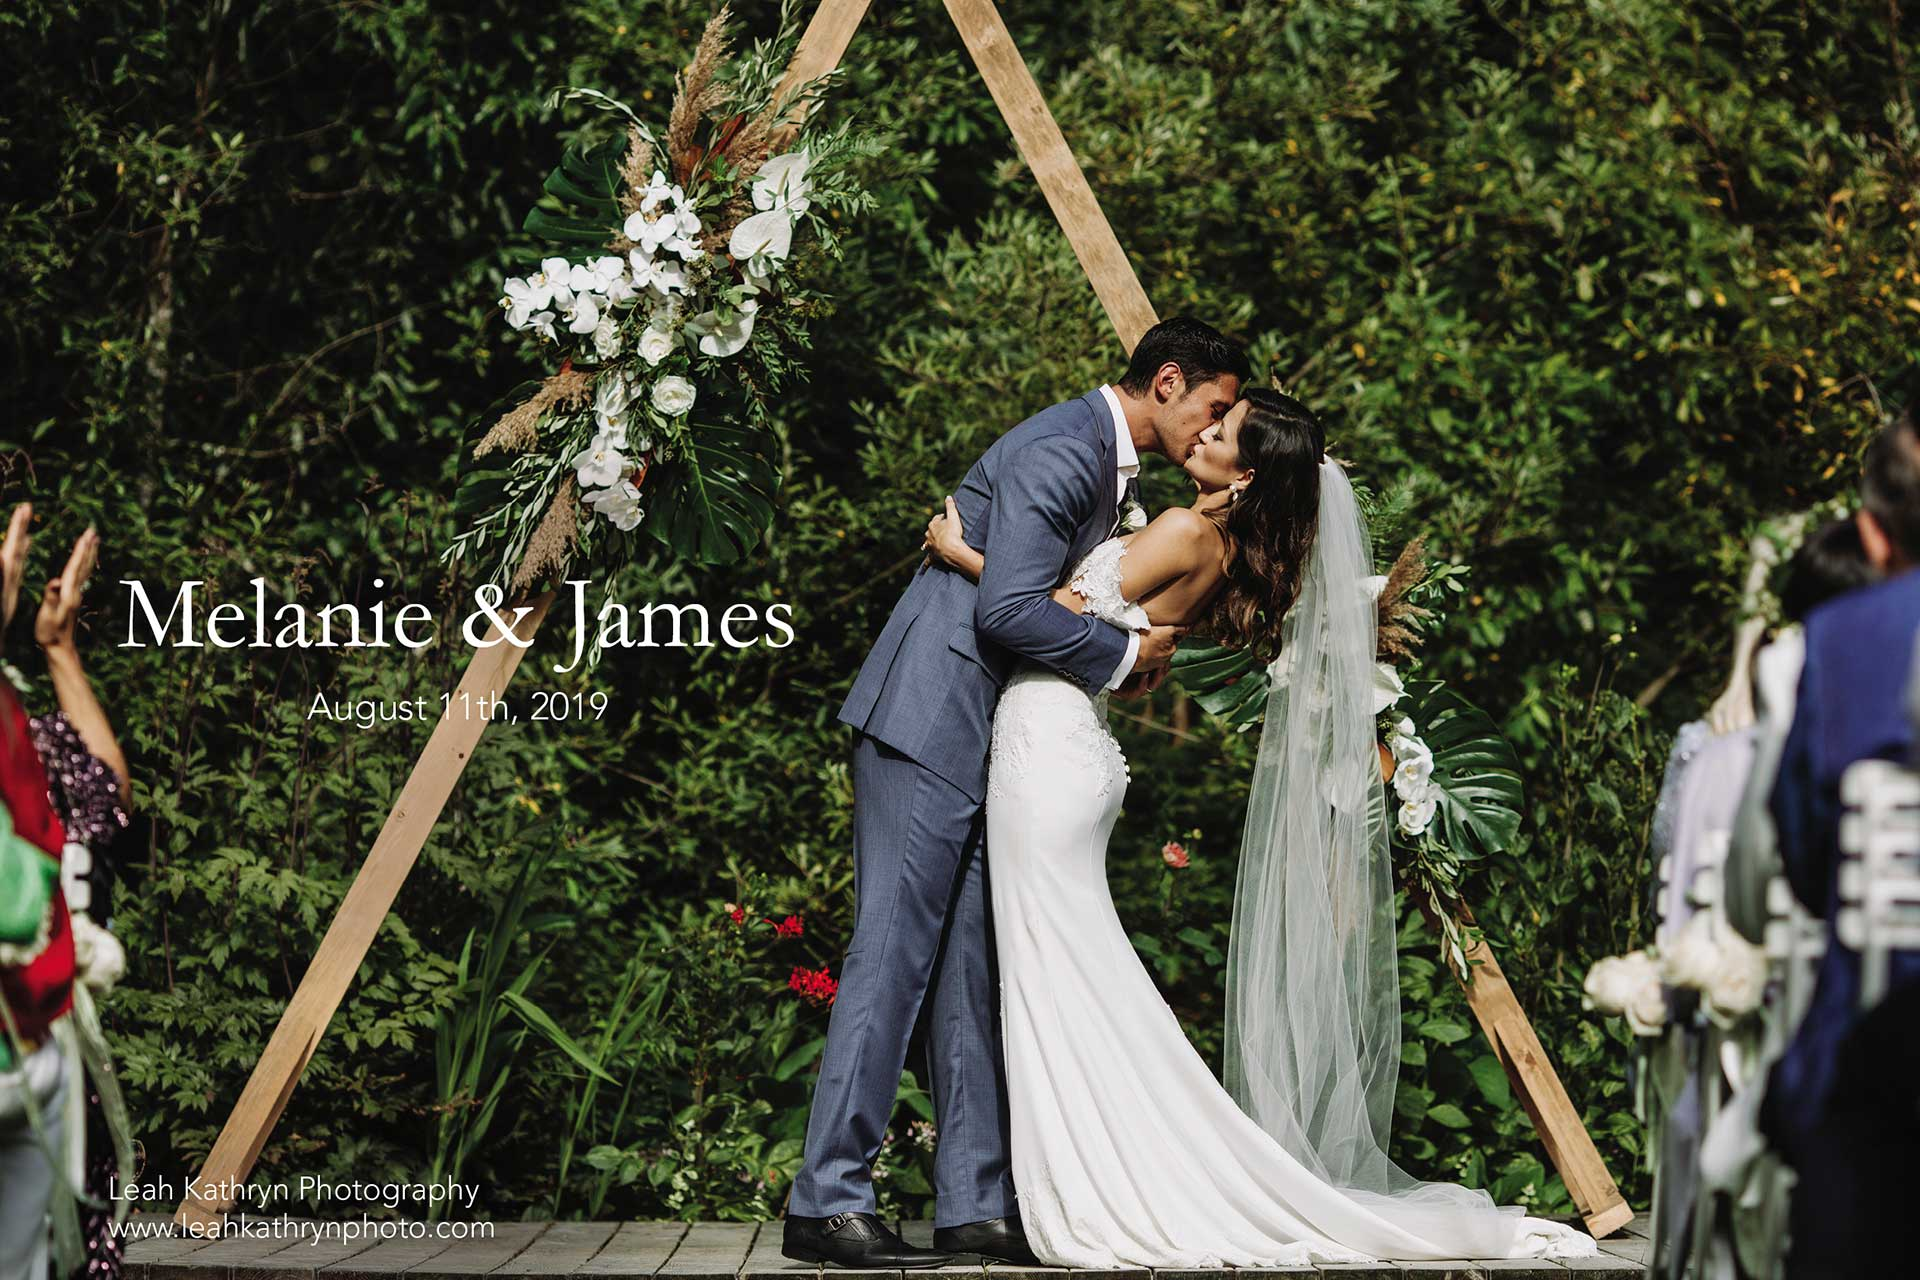 Melanie and James's Wedding